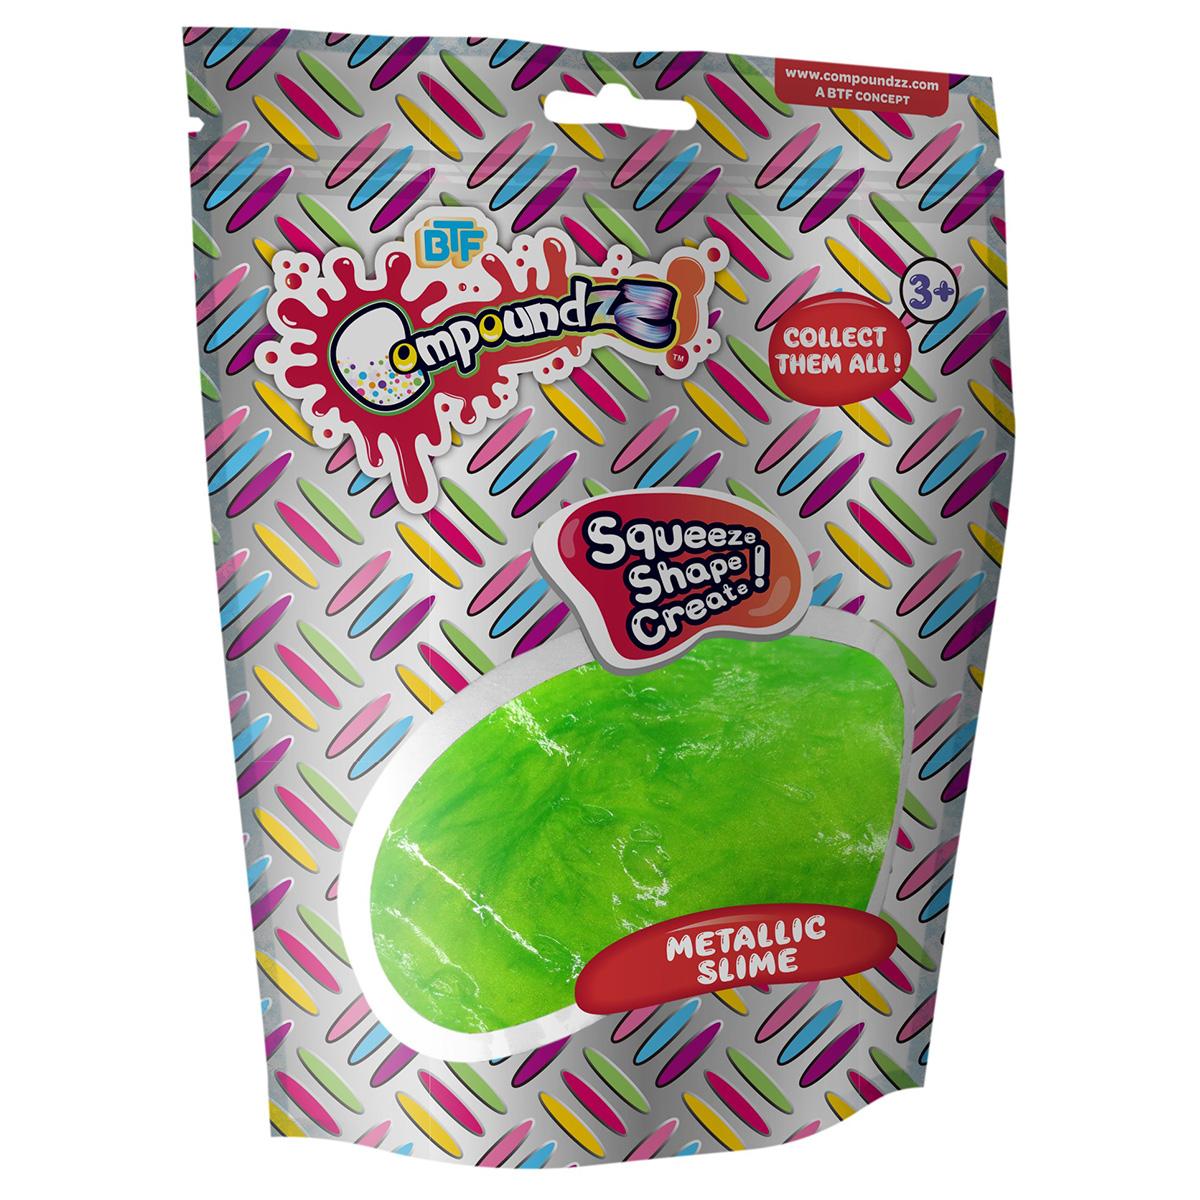 Punguta cu pasta modelatoare Compoundzz, Metallic Slime, Verde